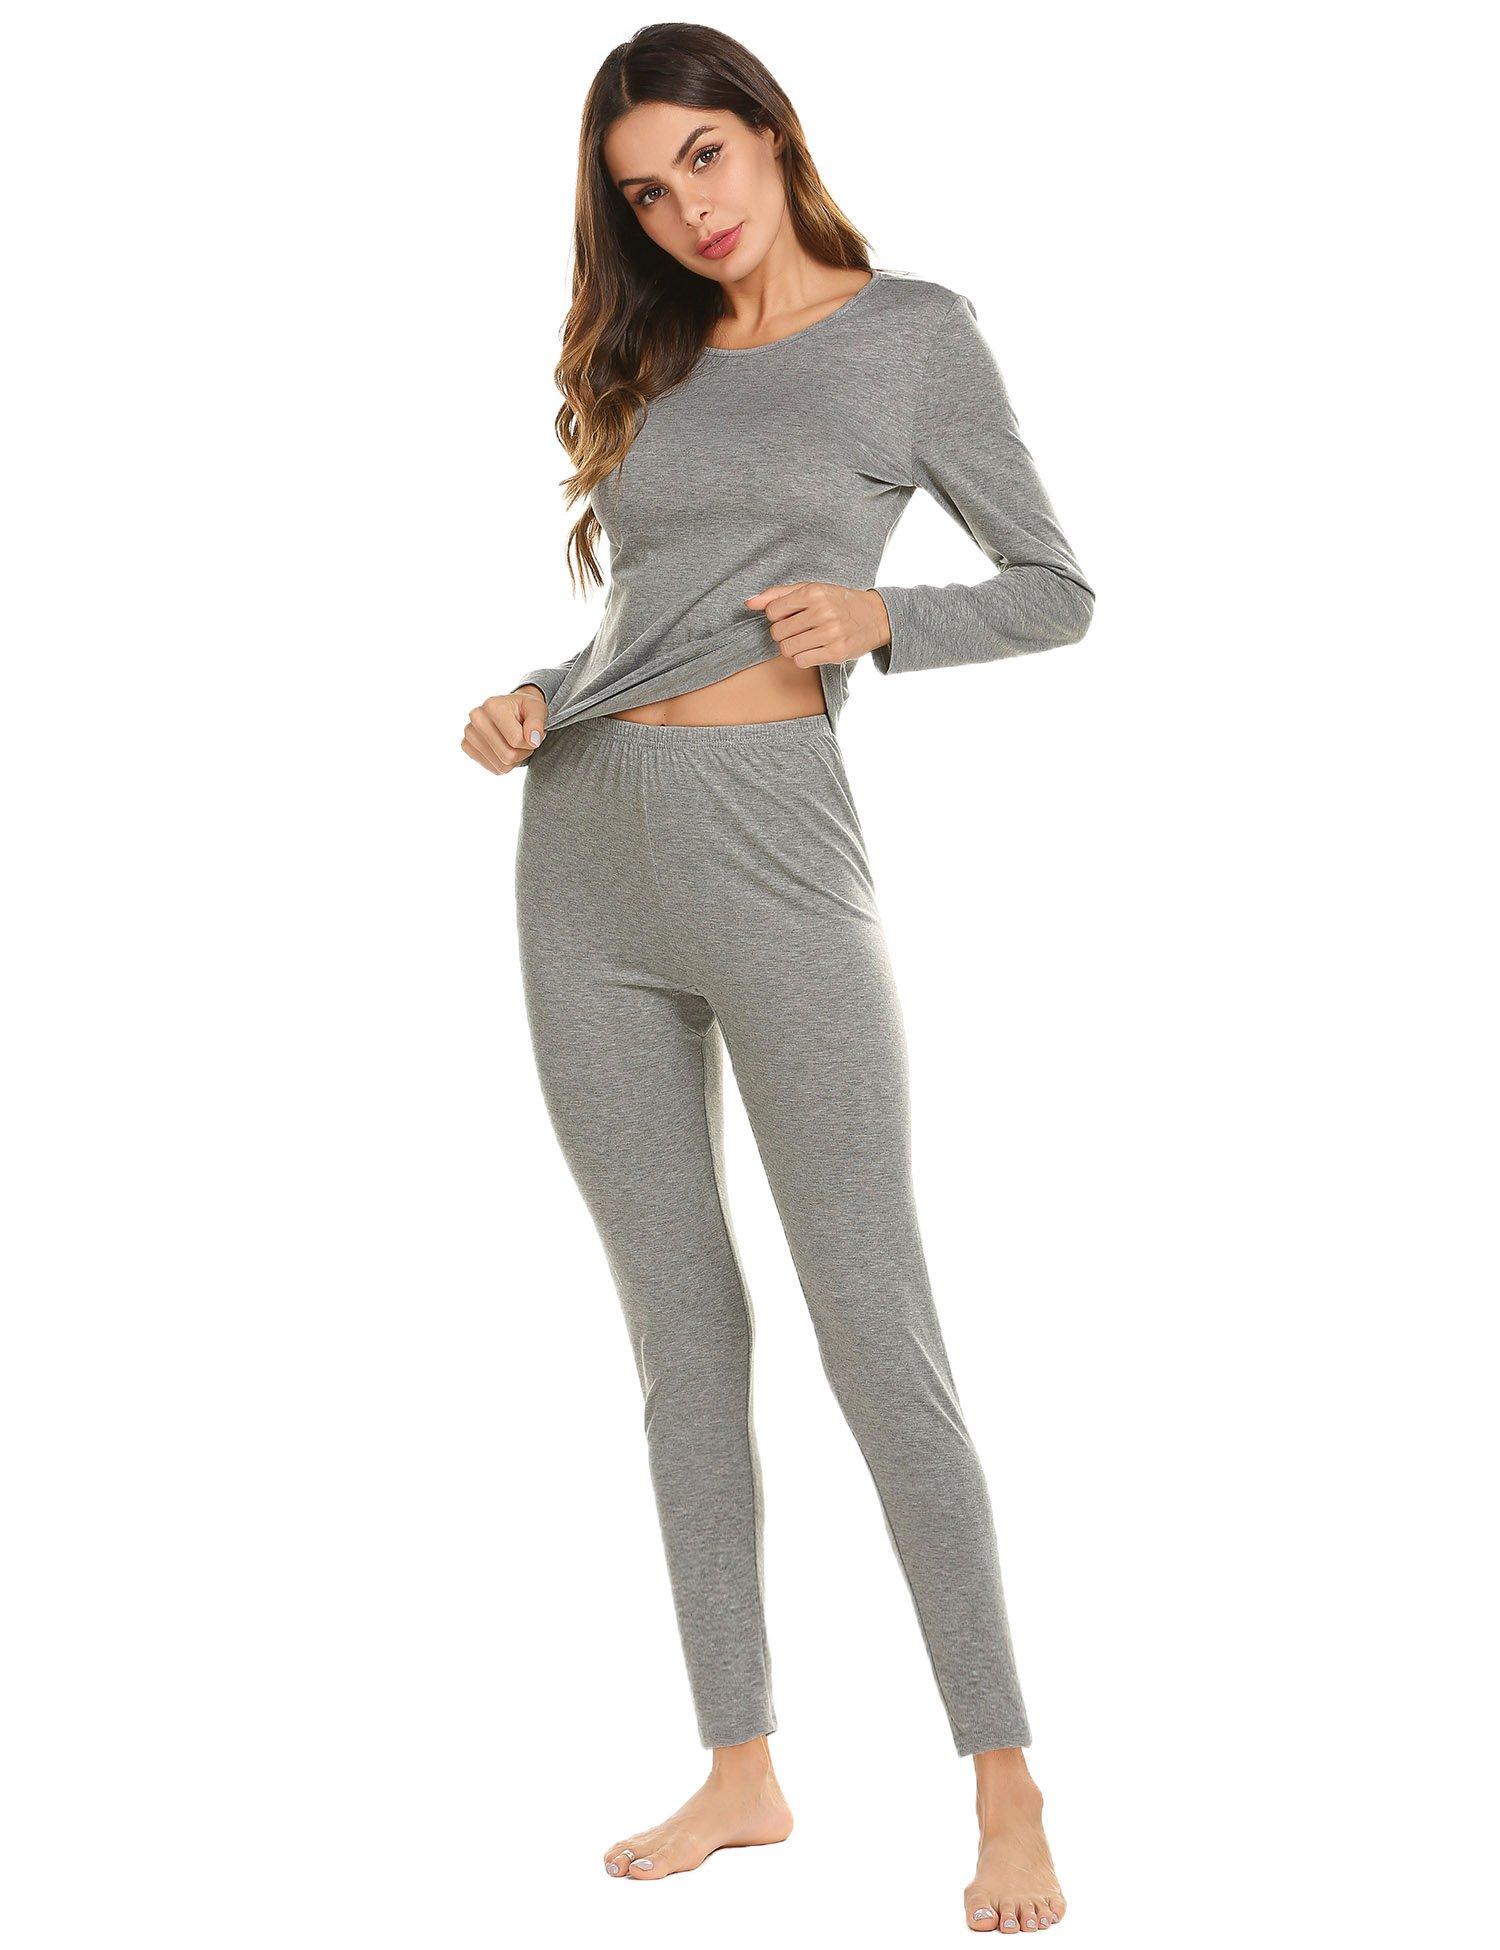 Ekouaer Thermal Underwear for Women,Long Johns Thermals Winter Base Layer Set S-XXXL